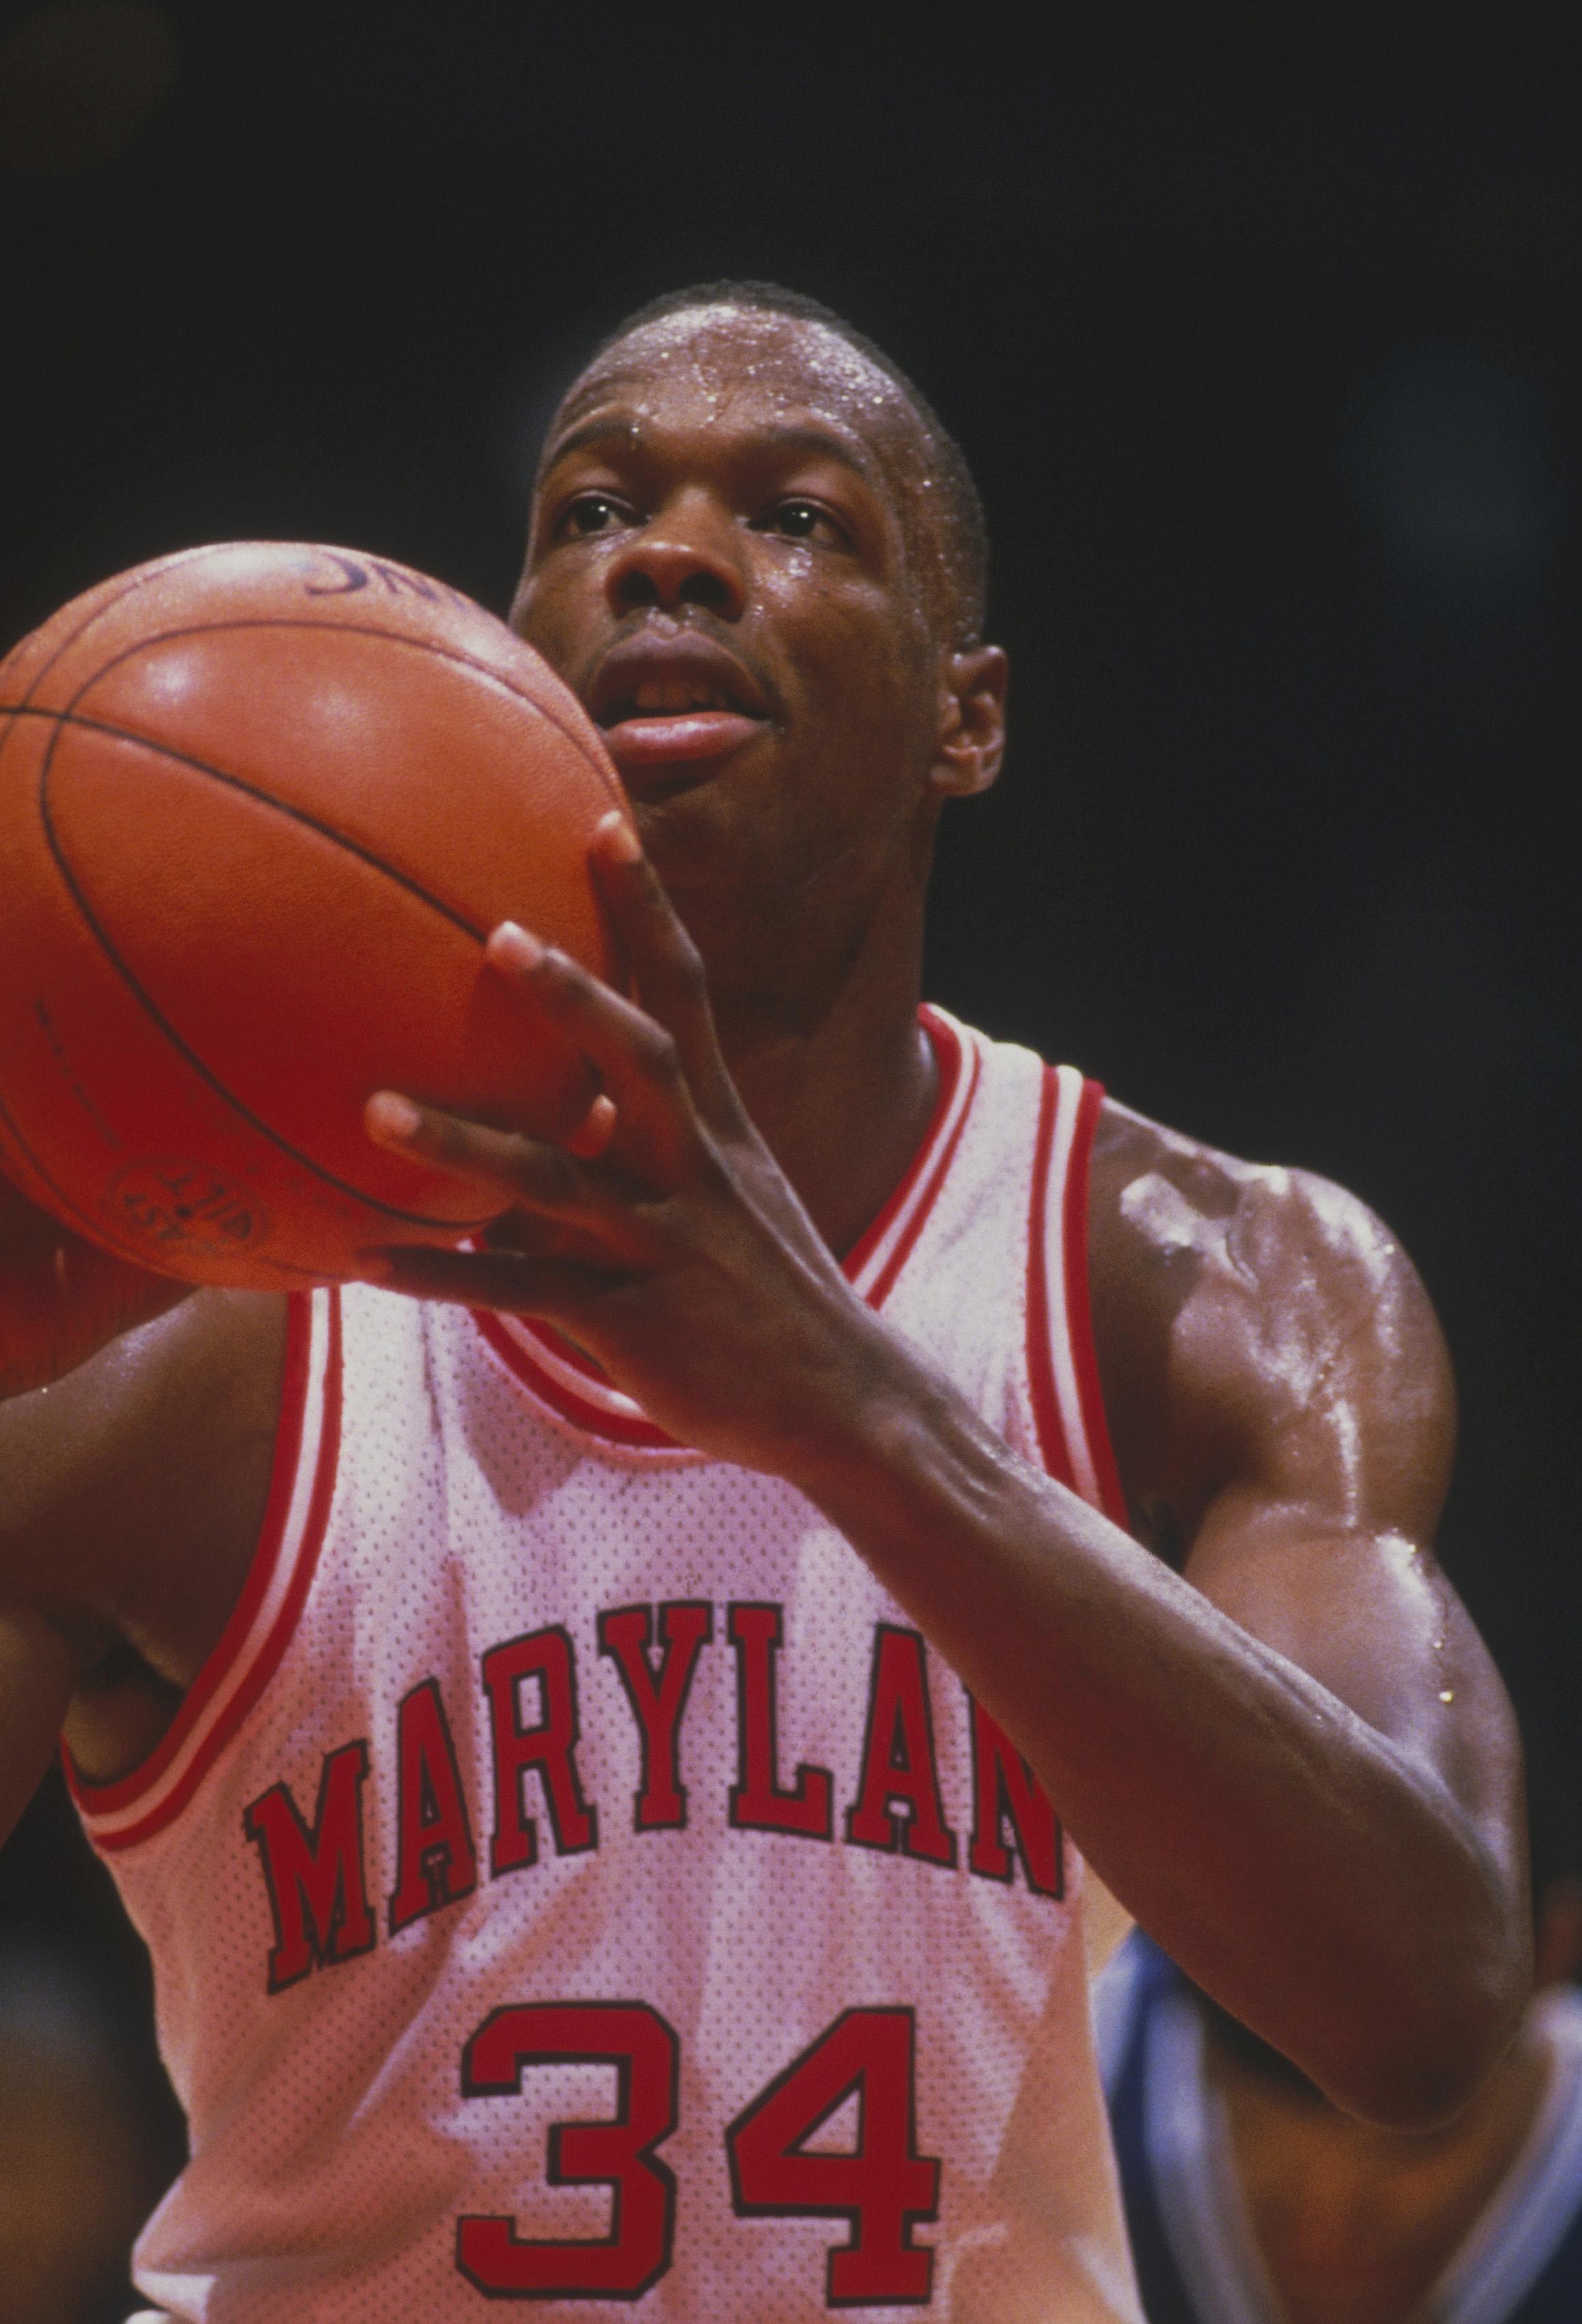 University of Maryland Basketball